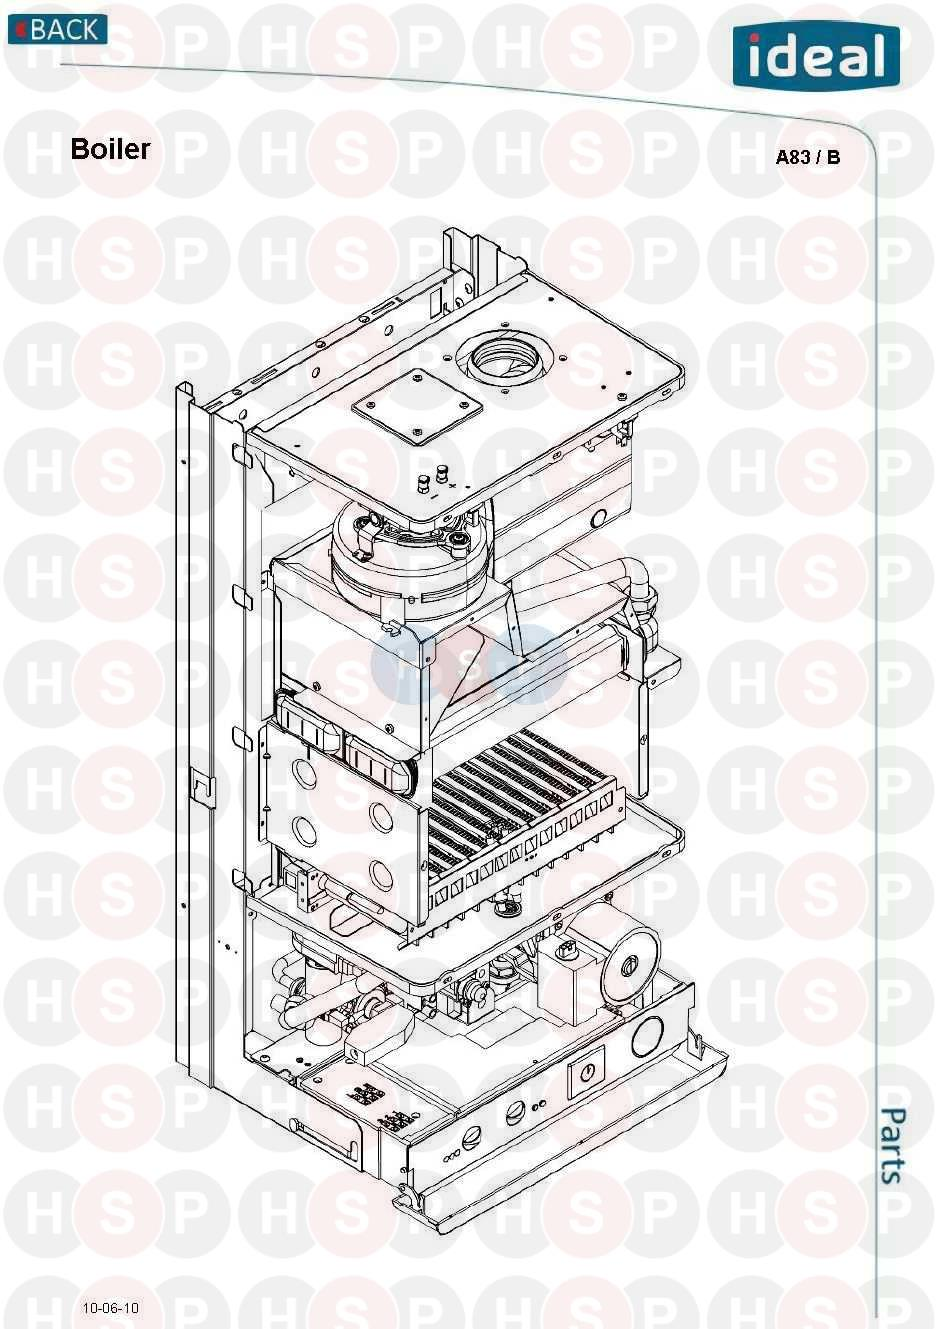 ideal mini he c24 appliance diagram  boiler